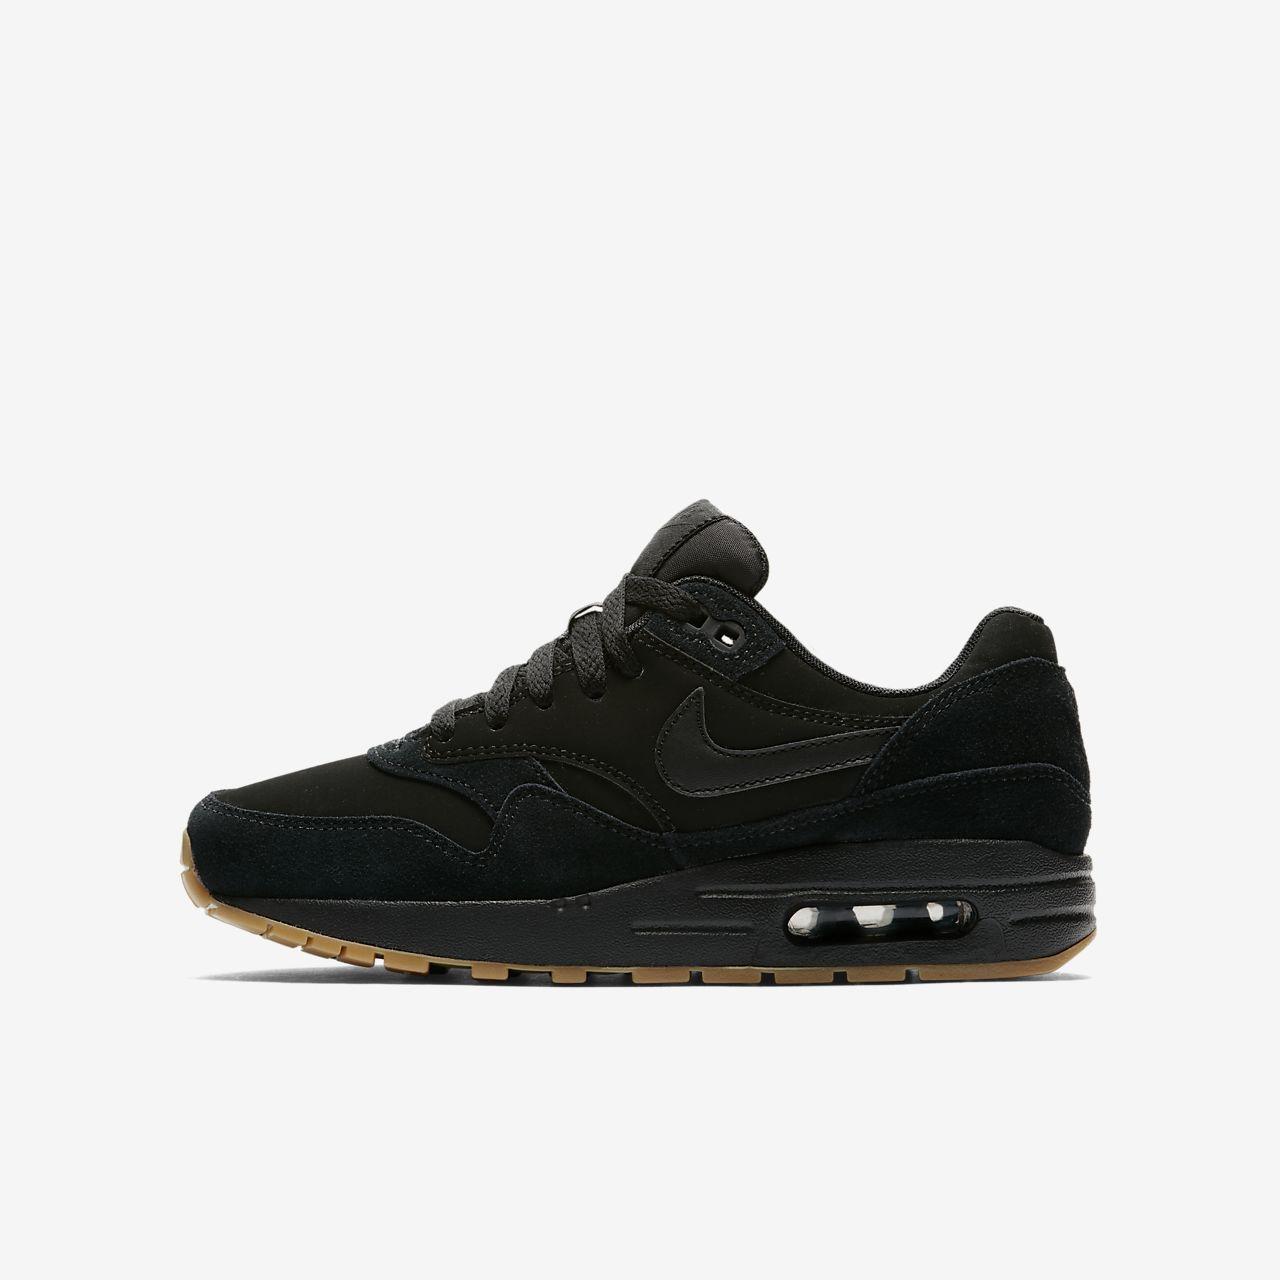 Nike Air Max 1 Zapatillas - Niño/a